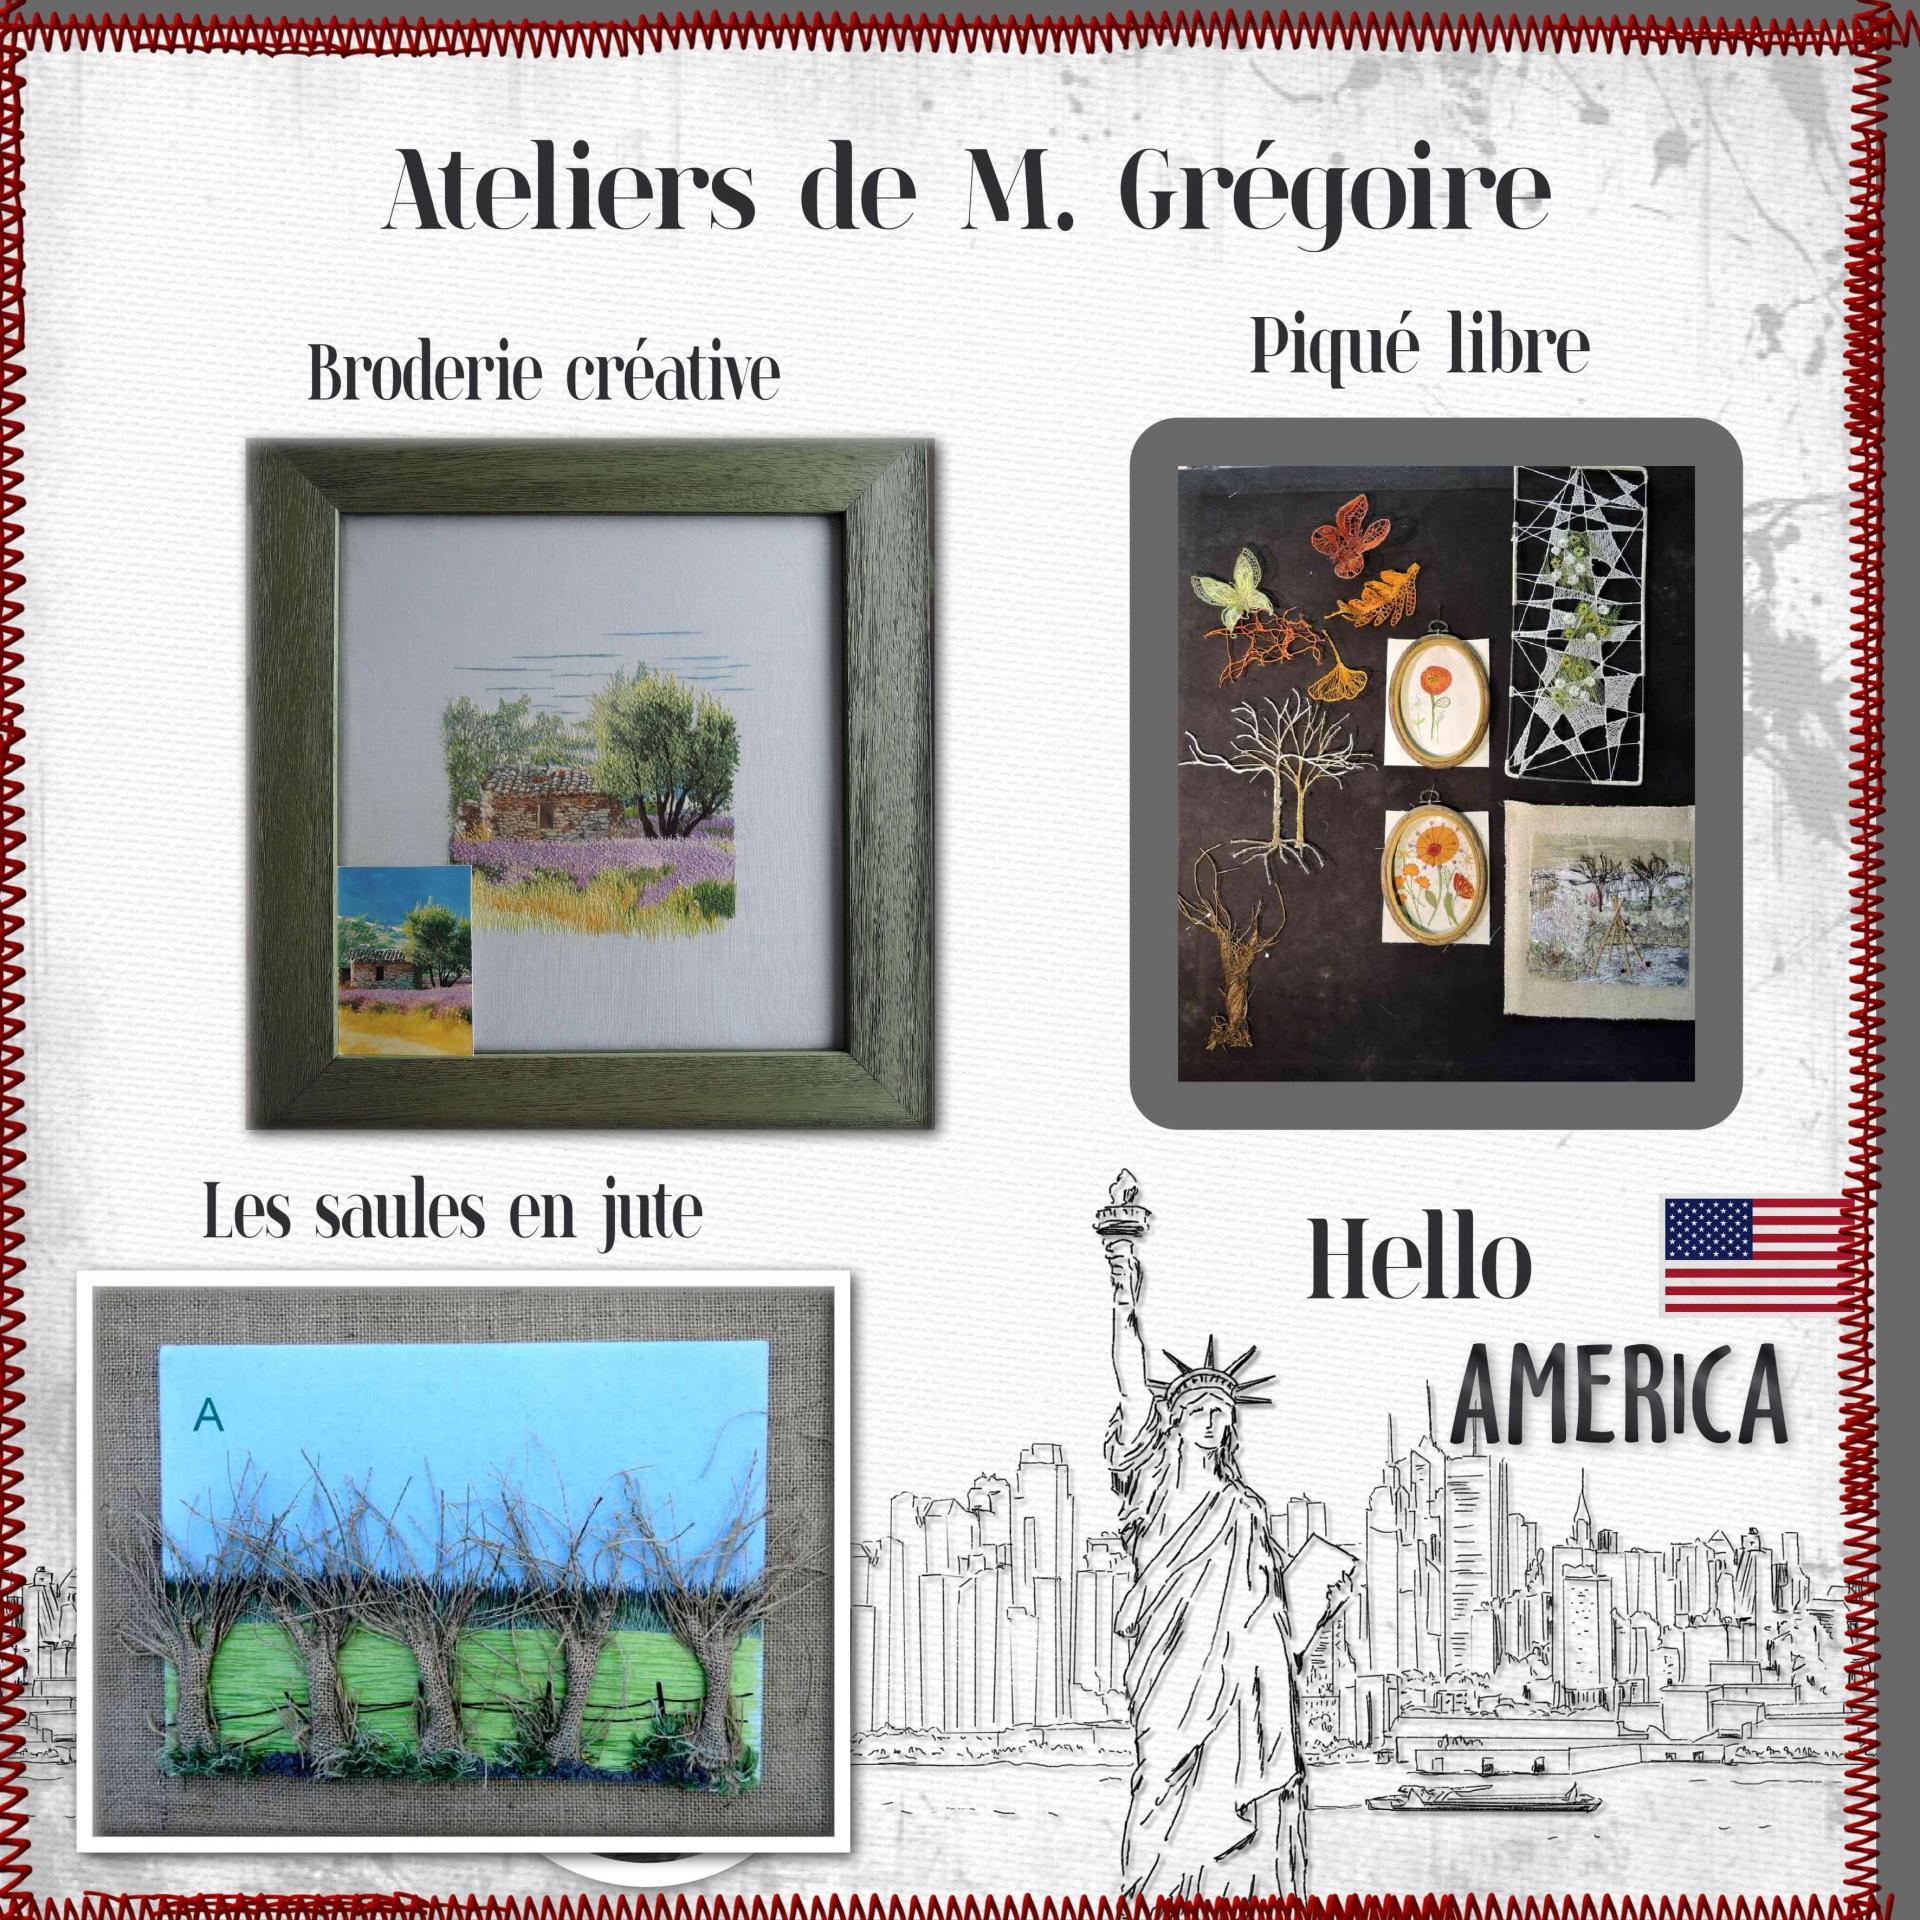 04 gregoire america